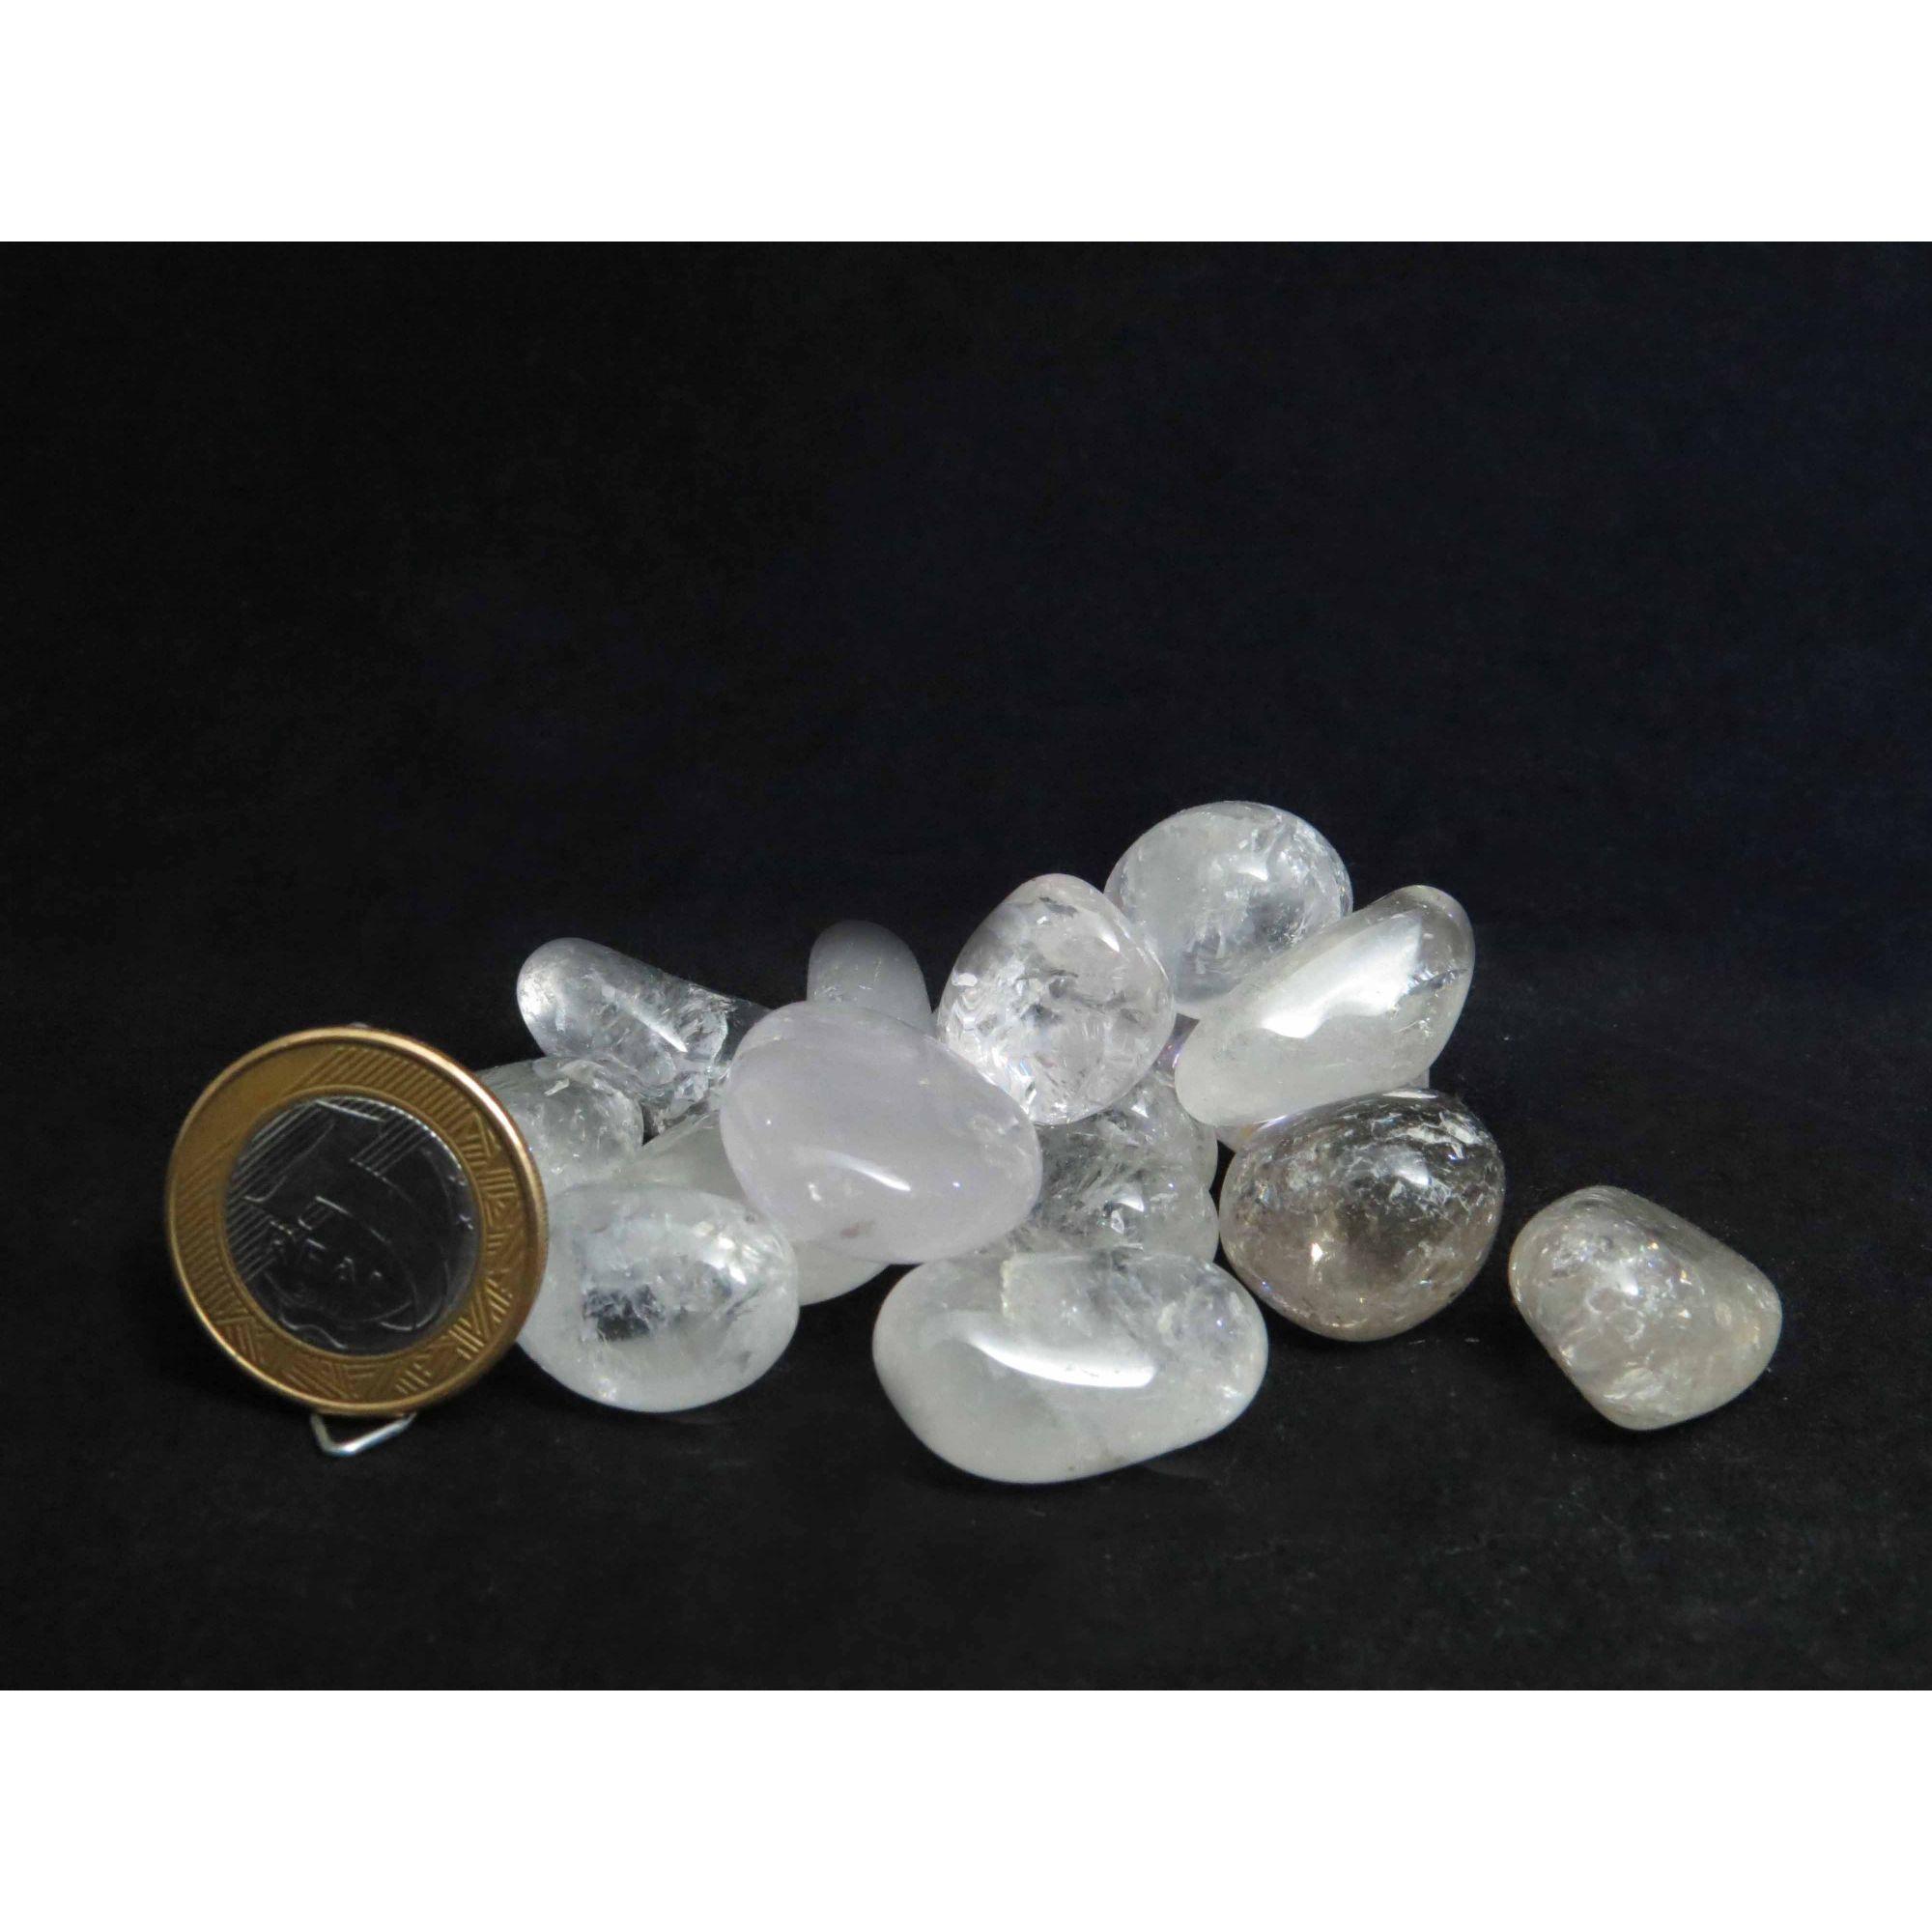 Cristal Rolado - Amostra Pequena